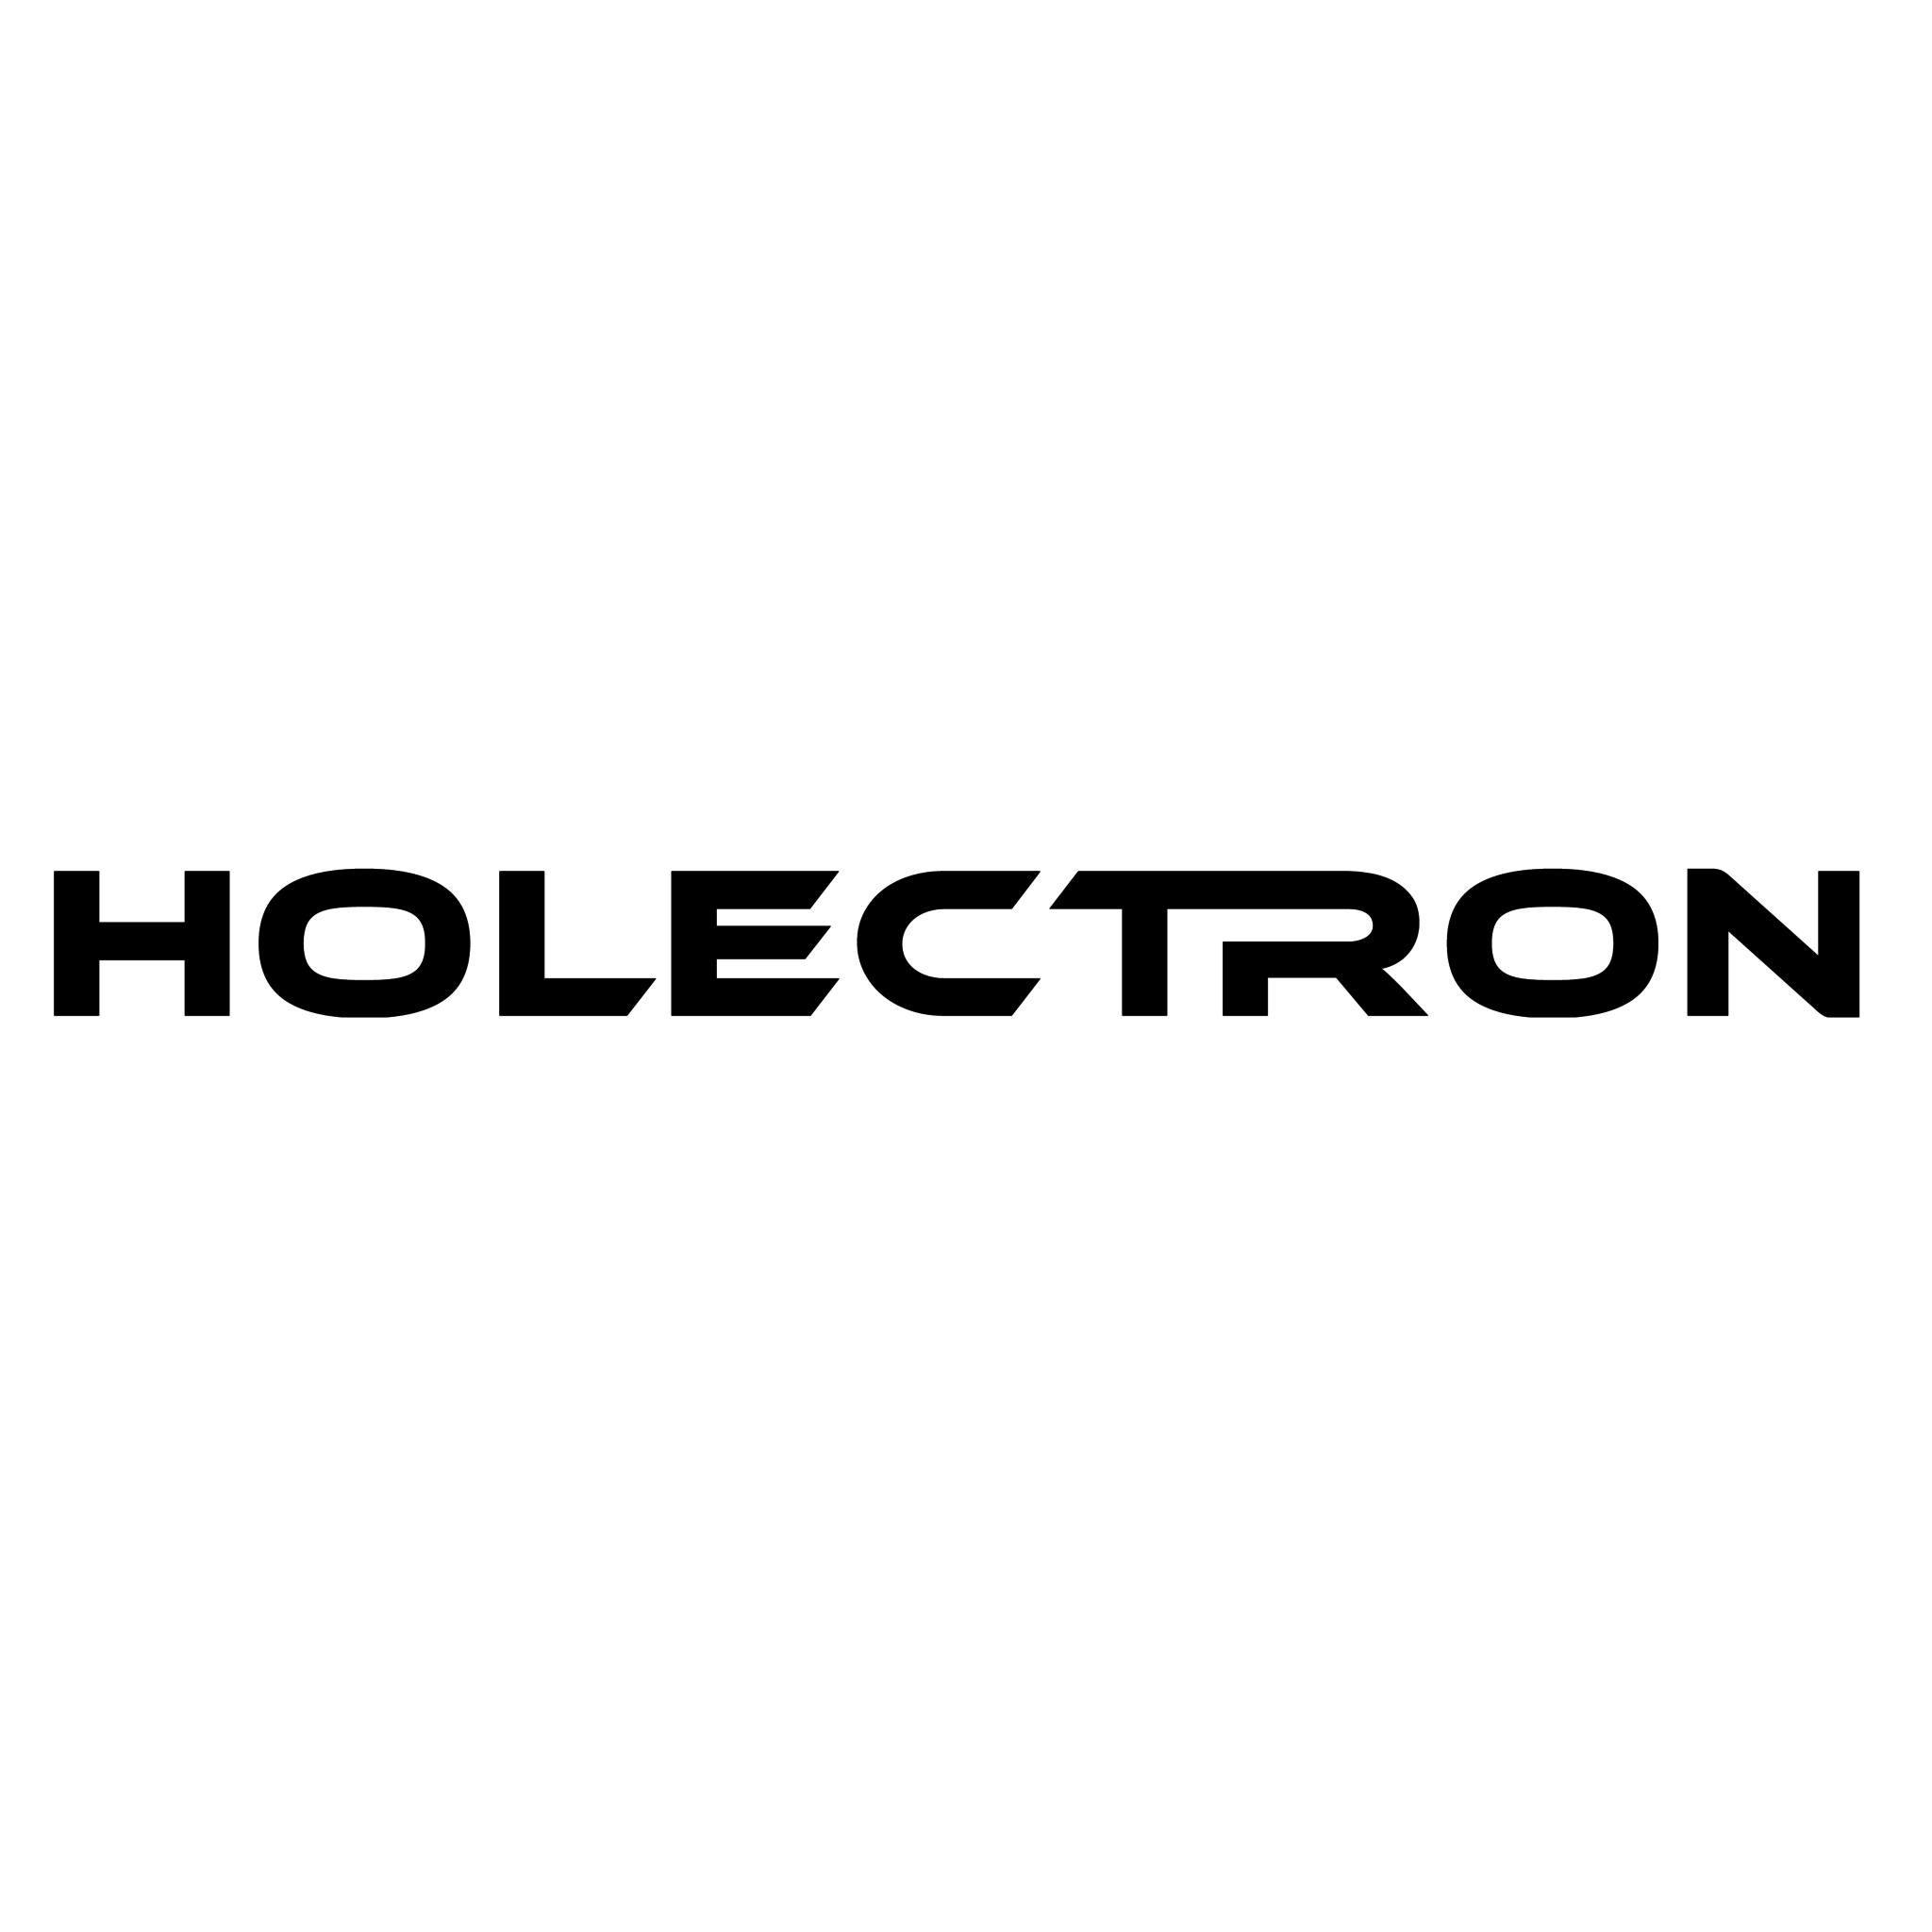 Holectron